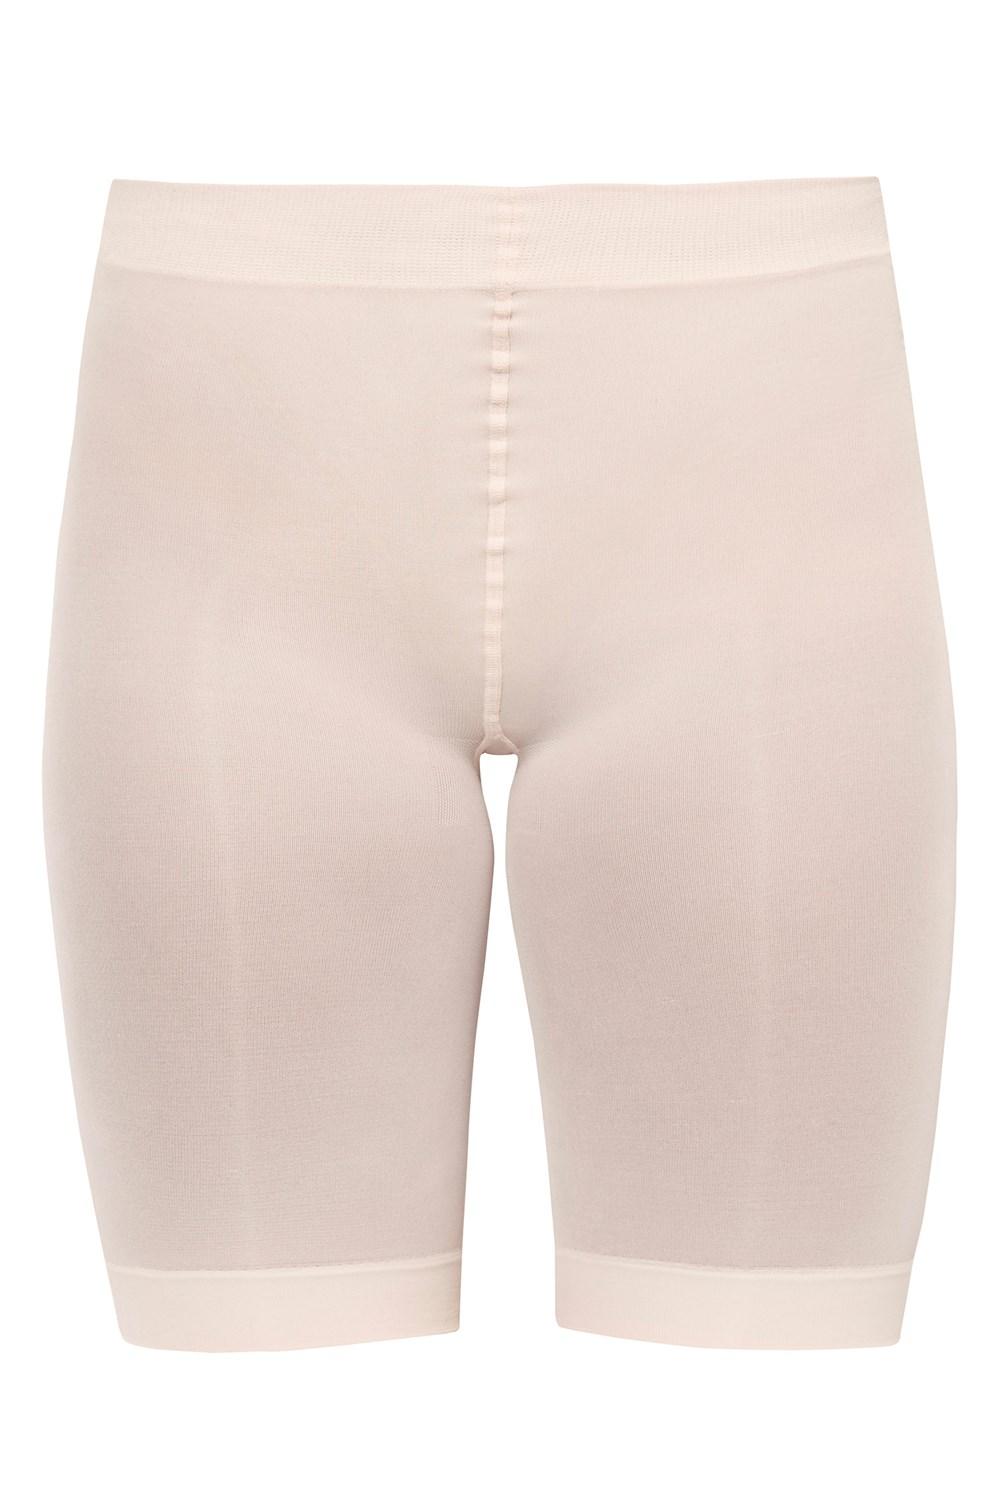 micro shorts nude